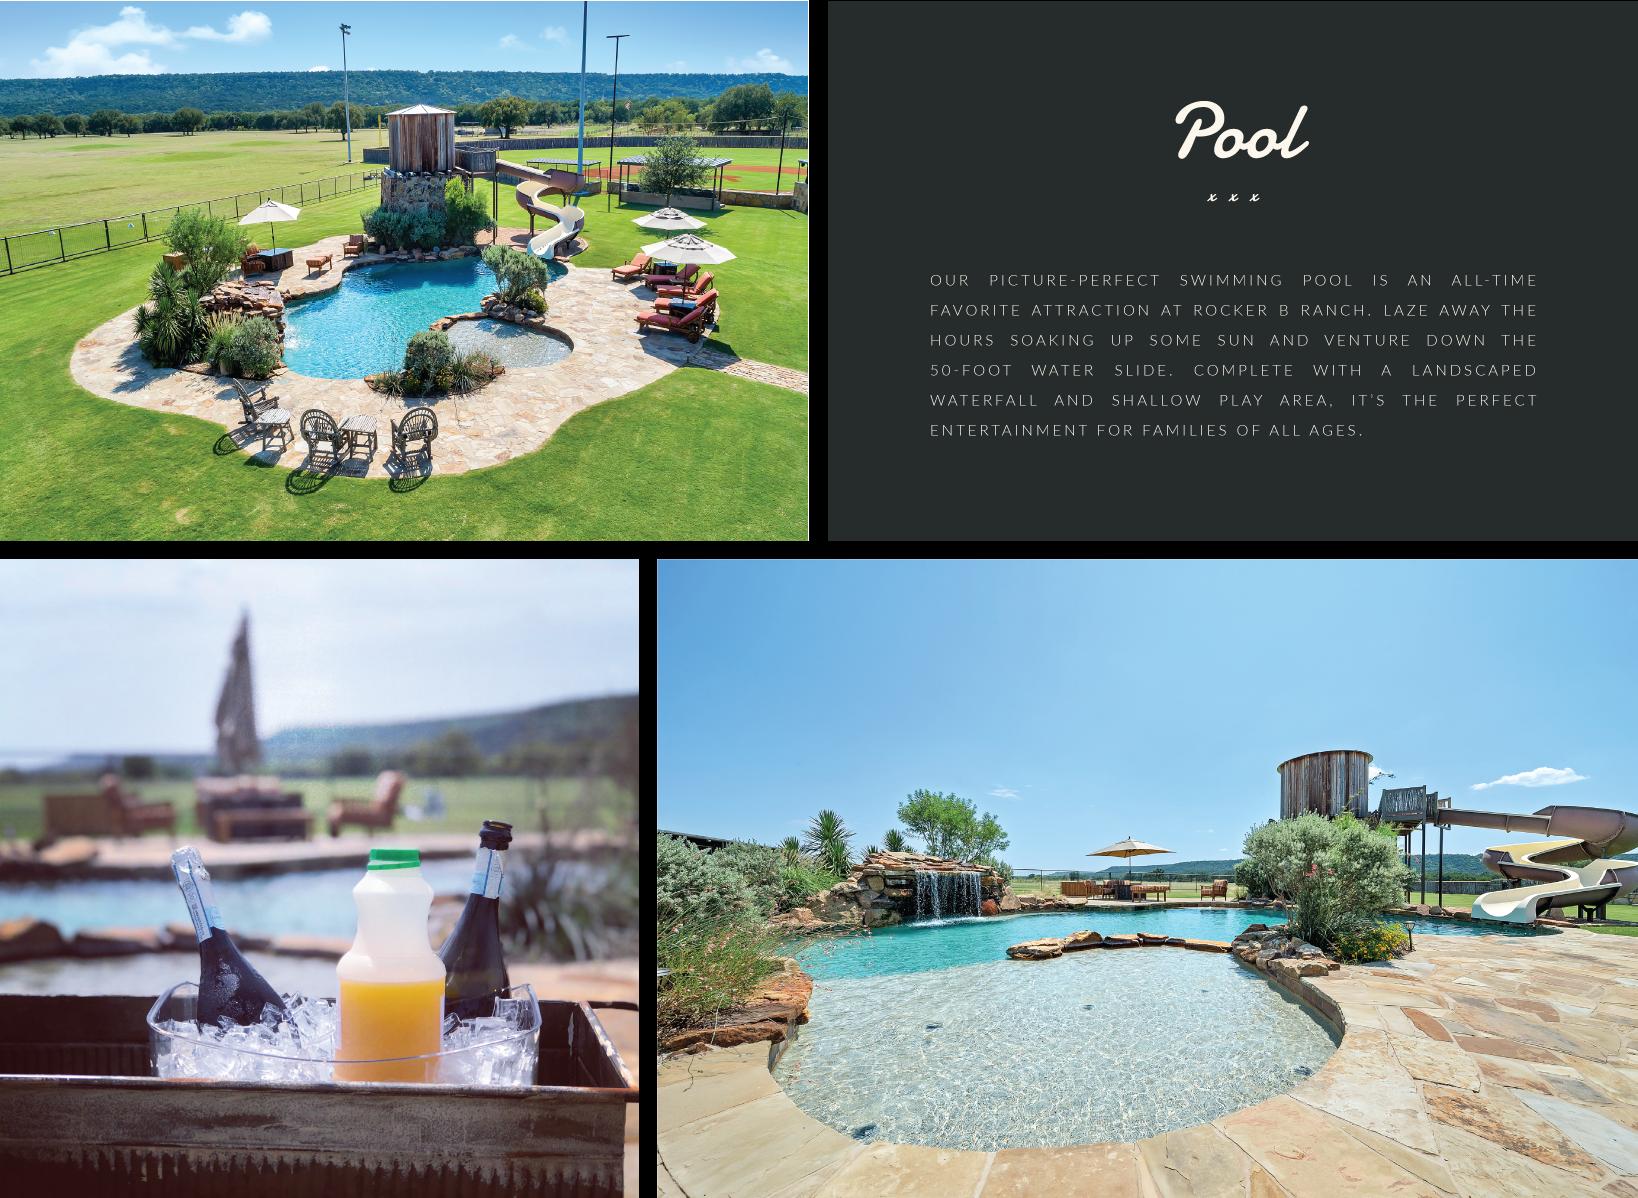 Pool-(3).png